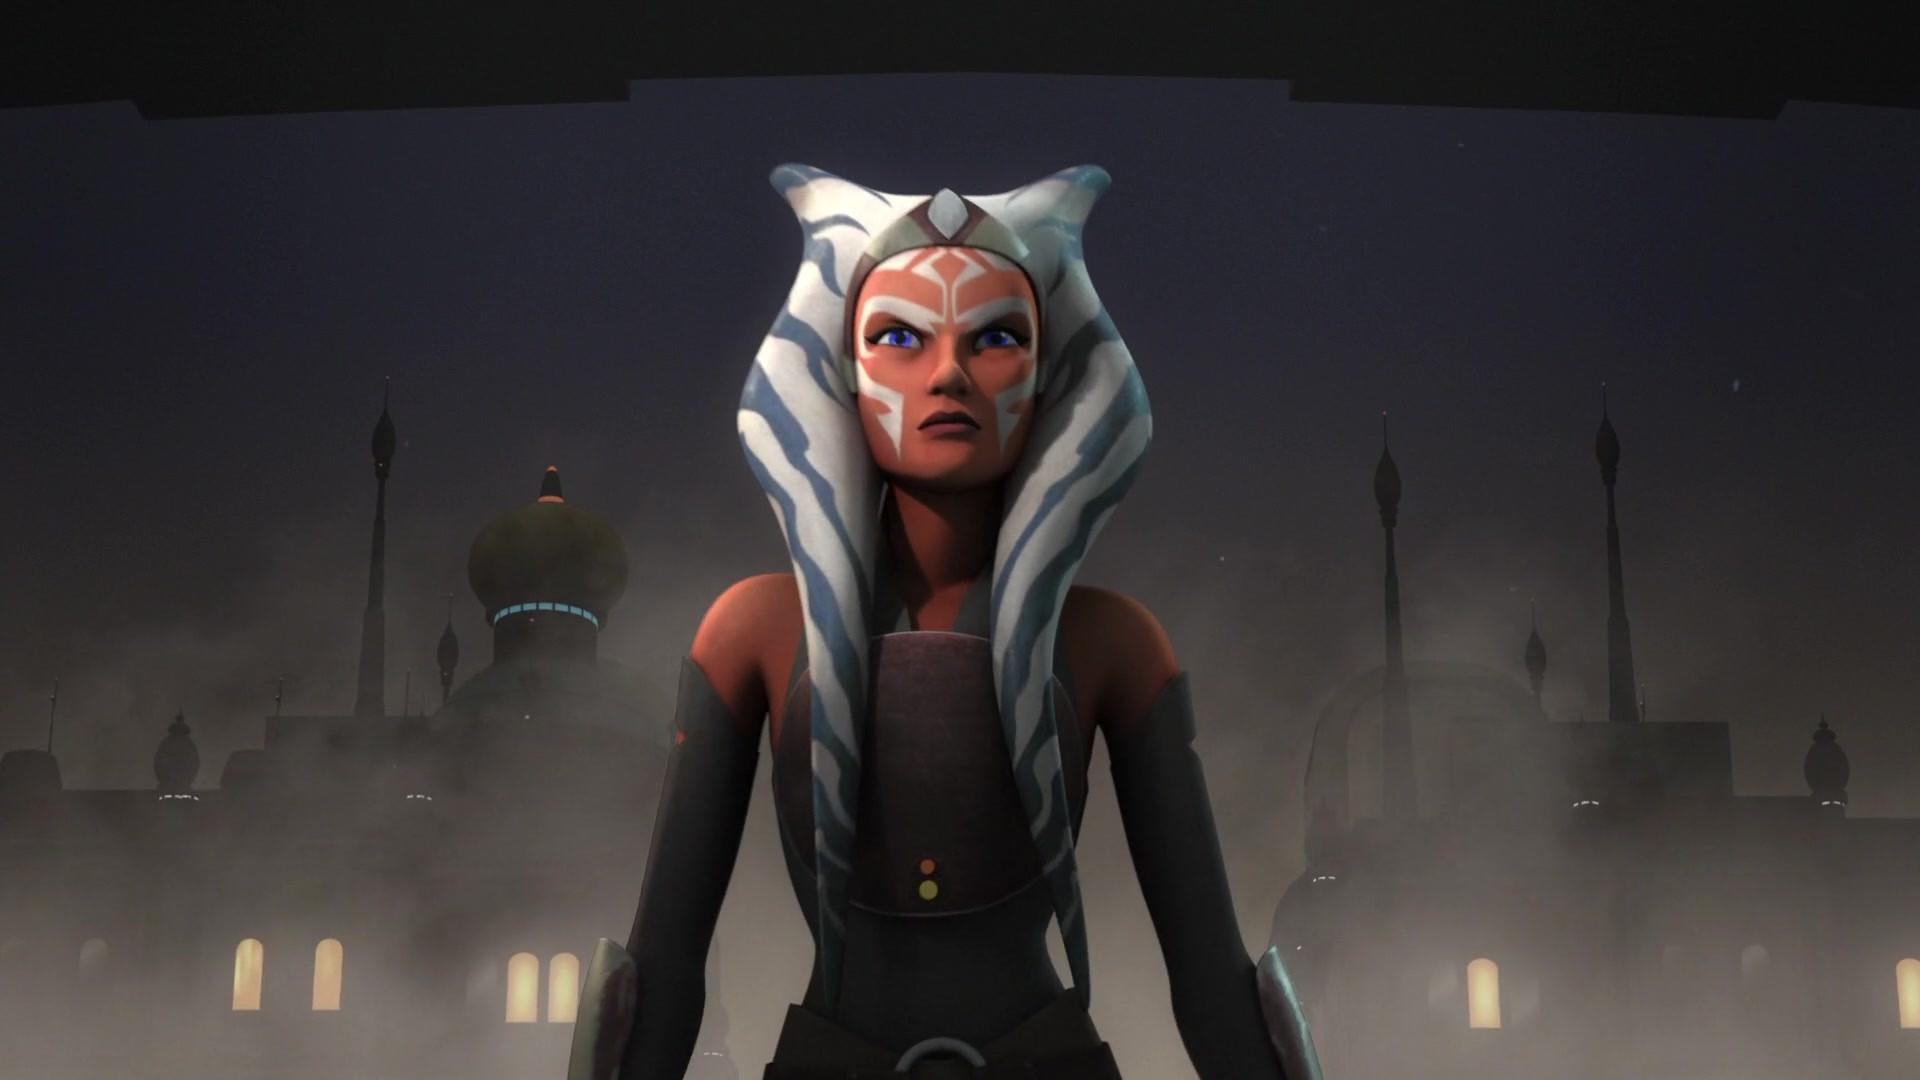 Star Wars Rebels Wallp...